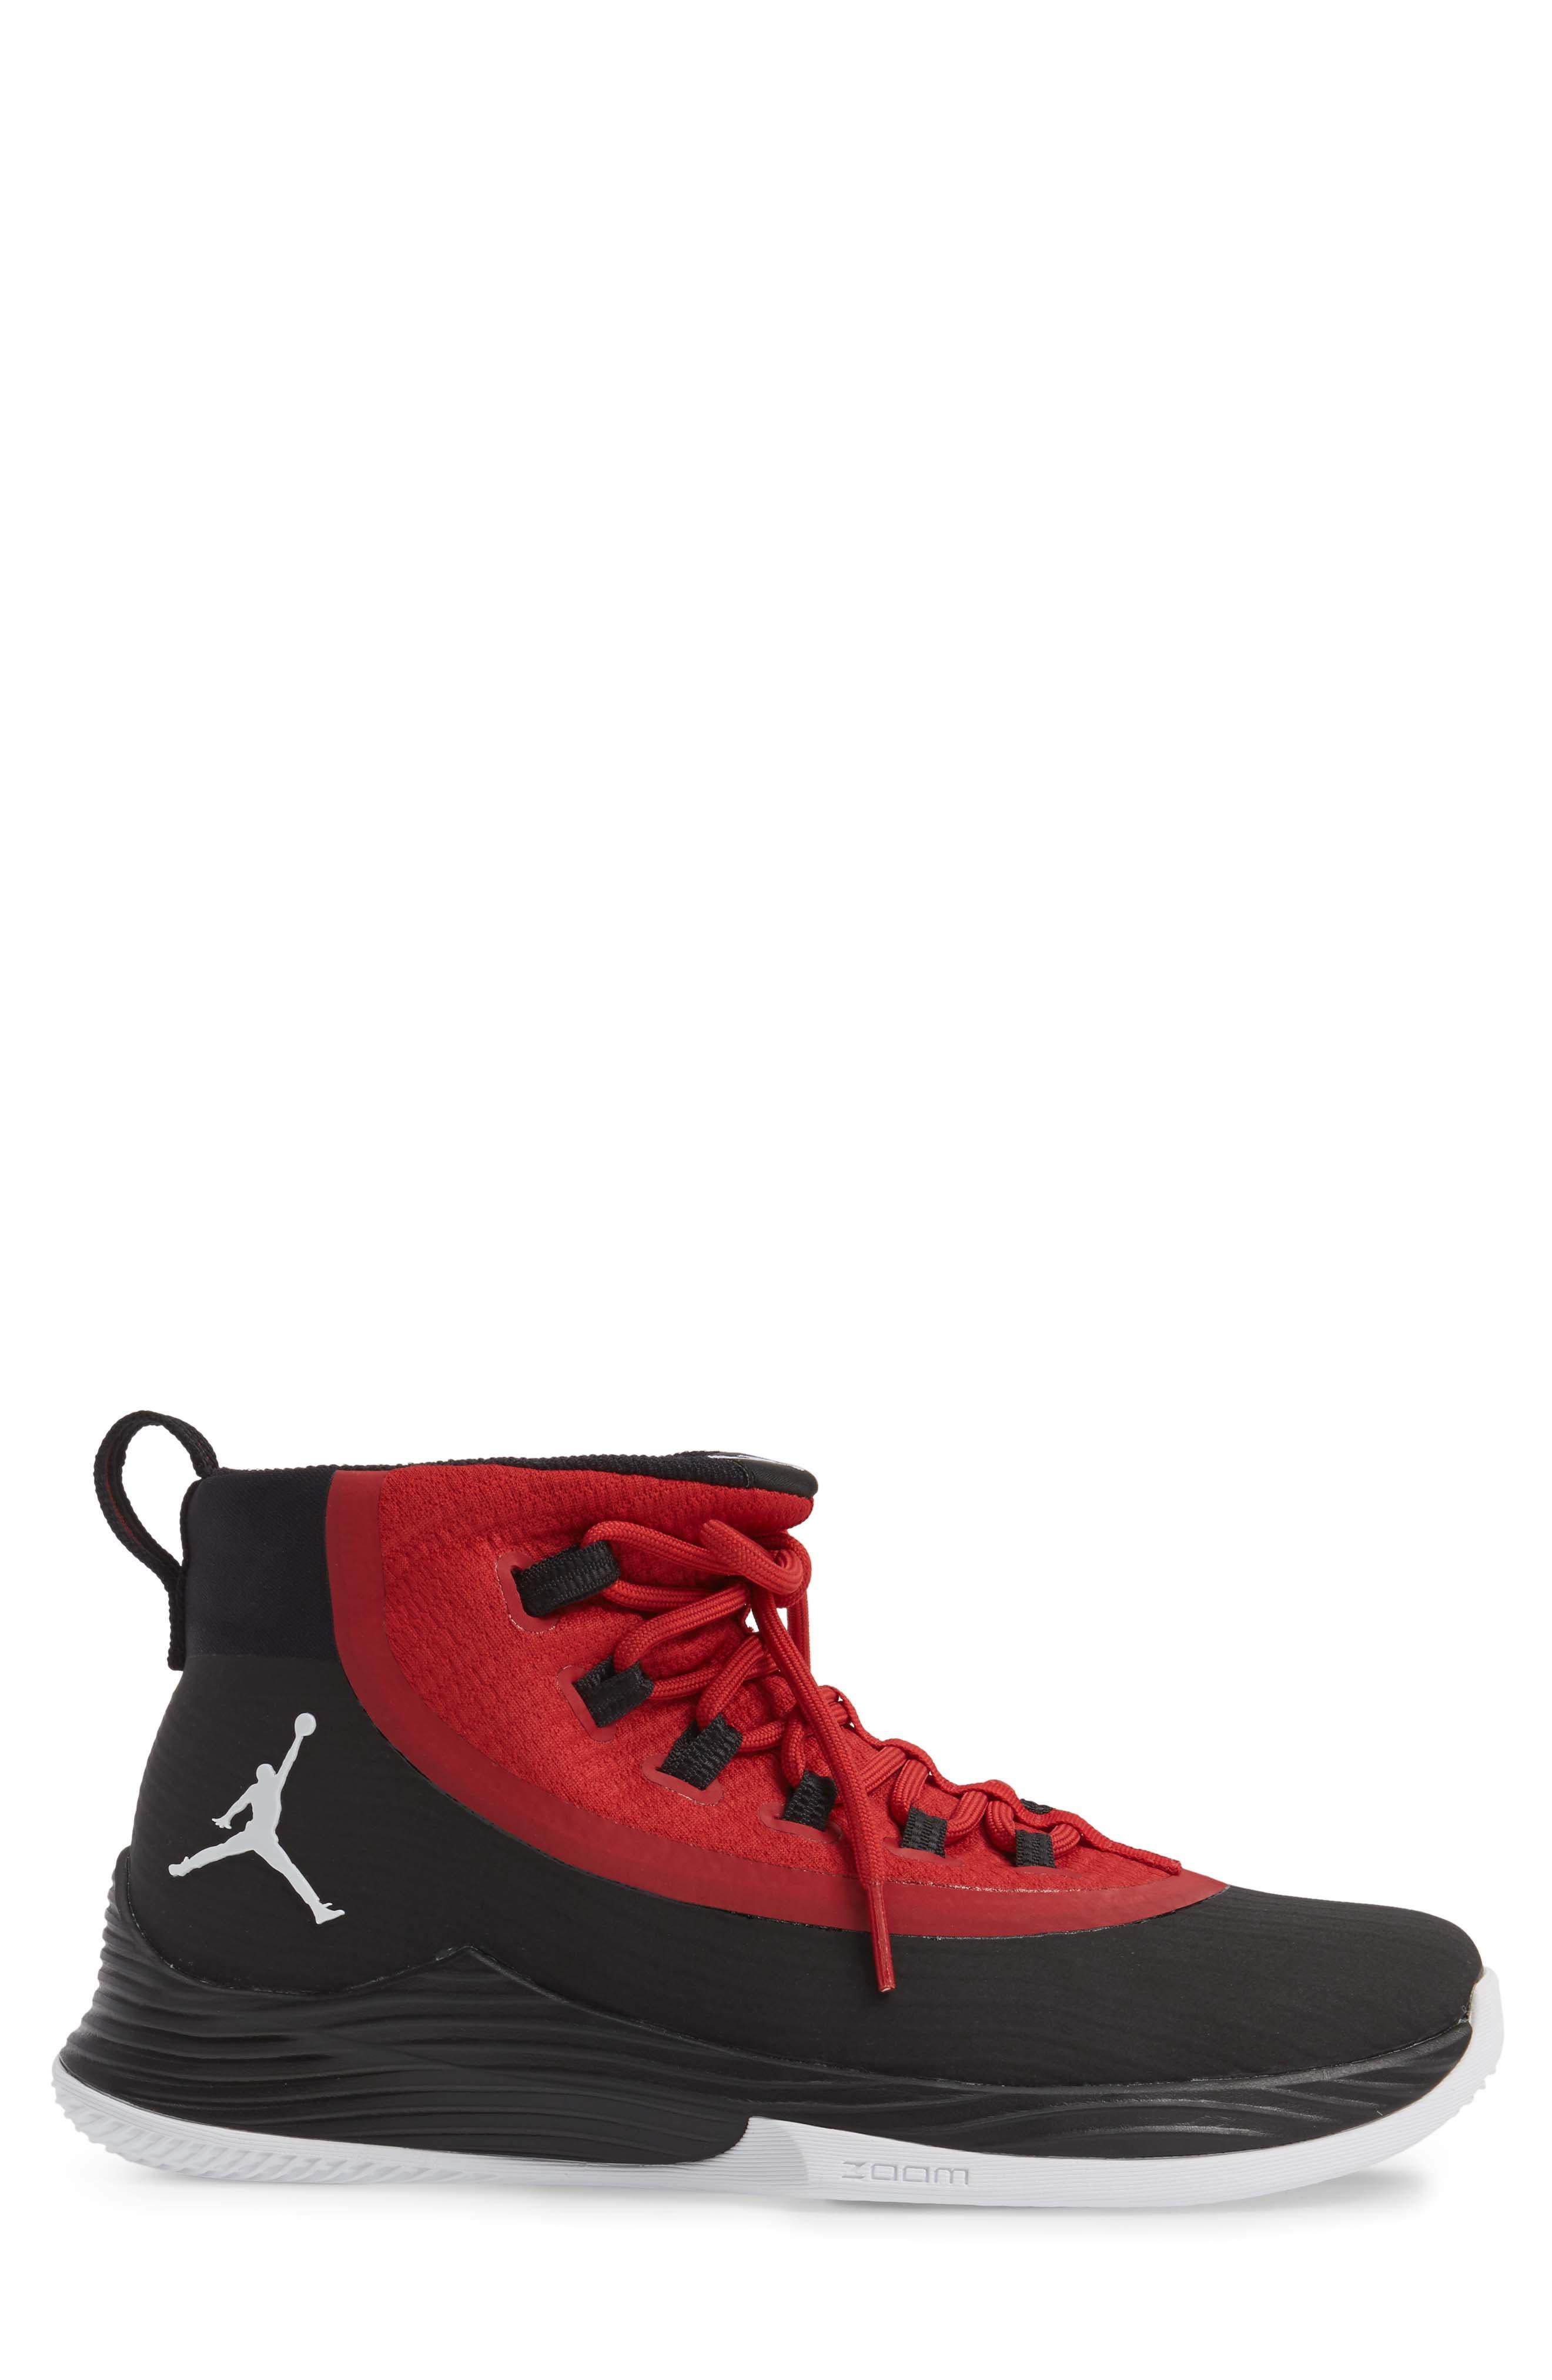 Jordan Ultra Fly 2 Basketball Shoe,                             Alternate thumbnail 12, color,